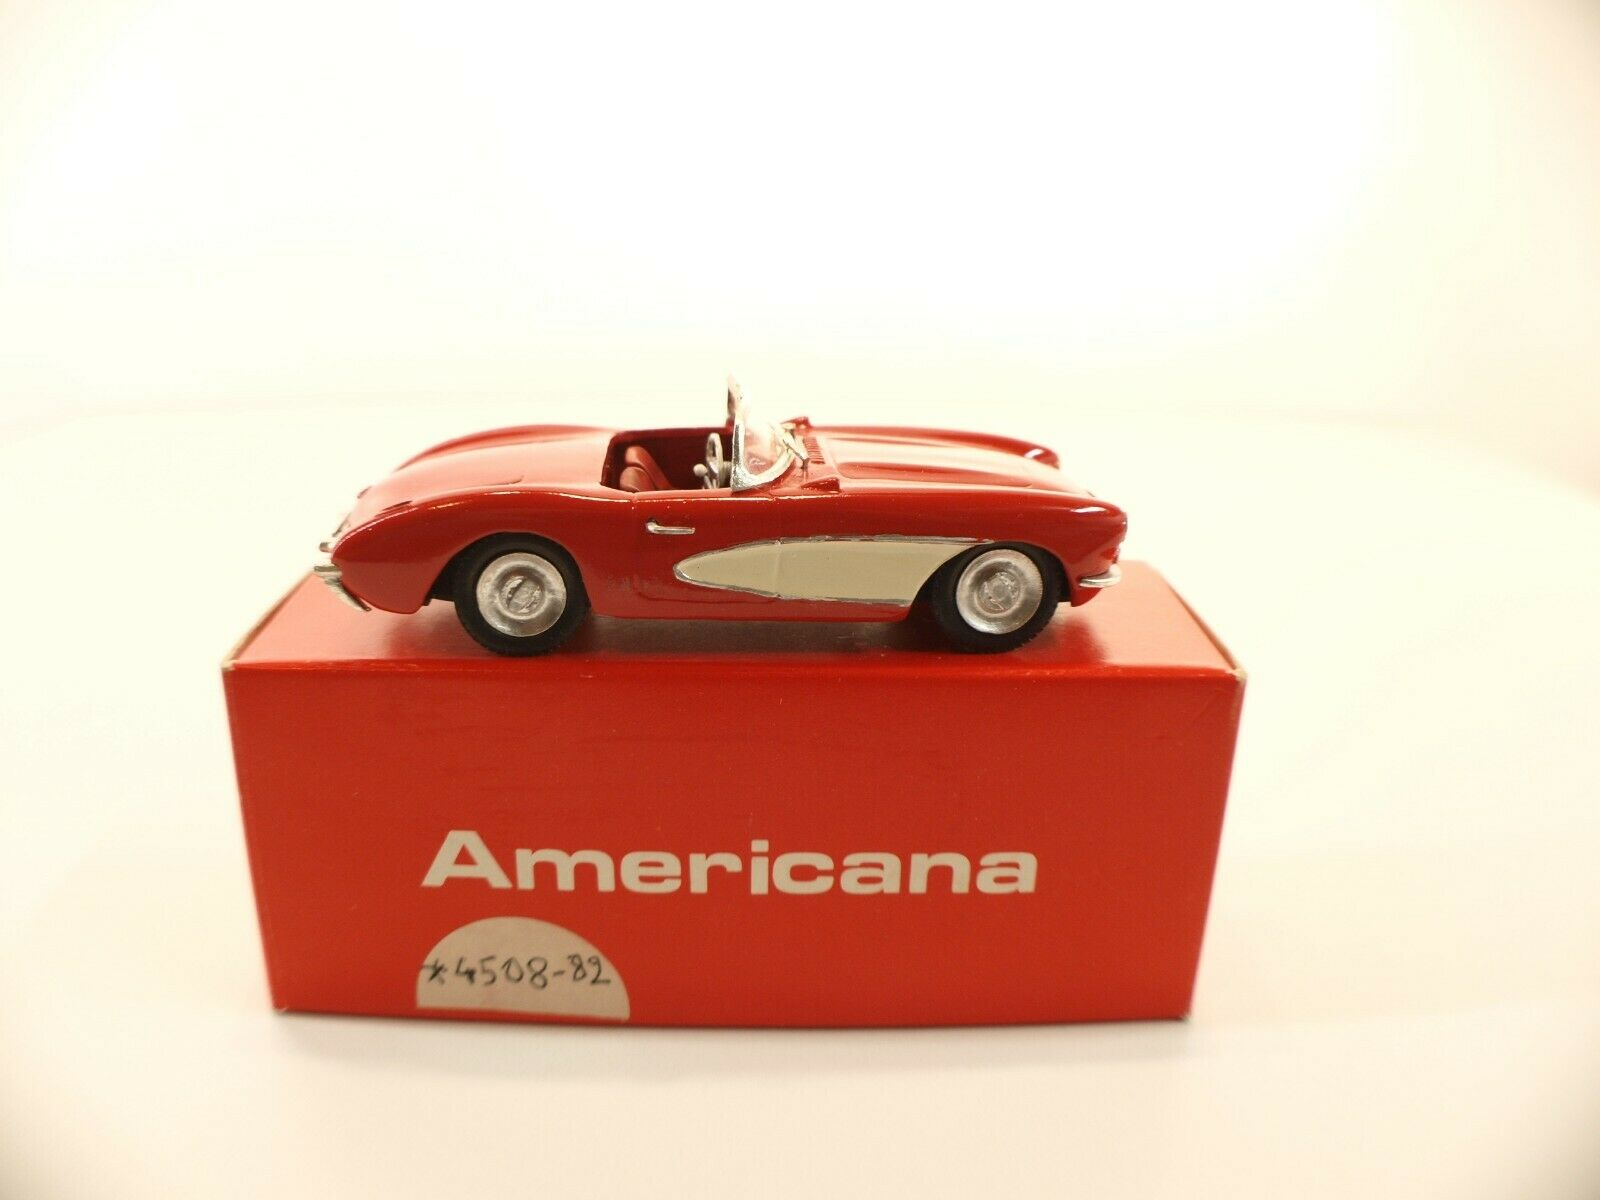 Americana 4a-chevrolet corvette 1956 - 1 43 mounted kit